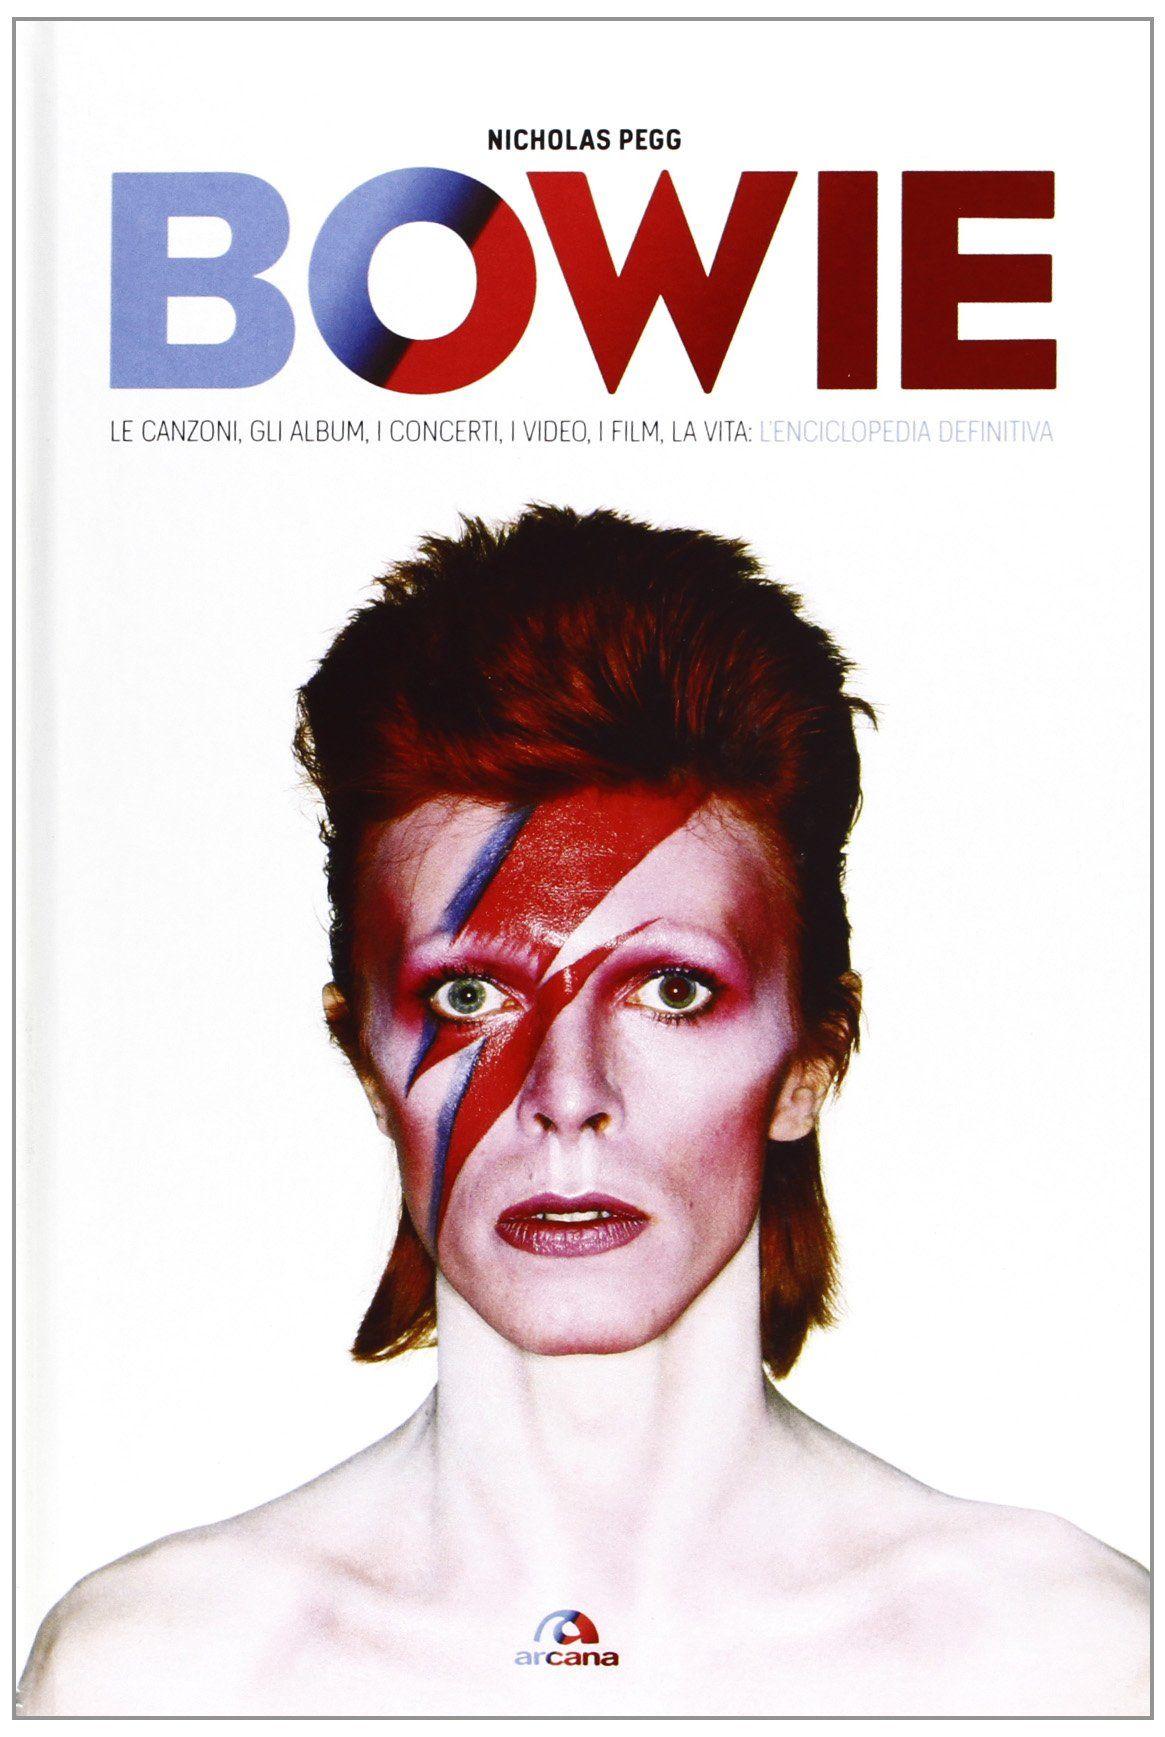 Bowie, l'enciclopedia definitiva, libro di Nicholas Pegg